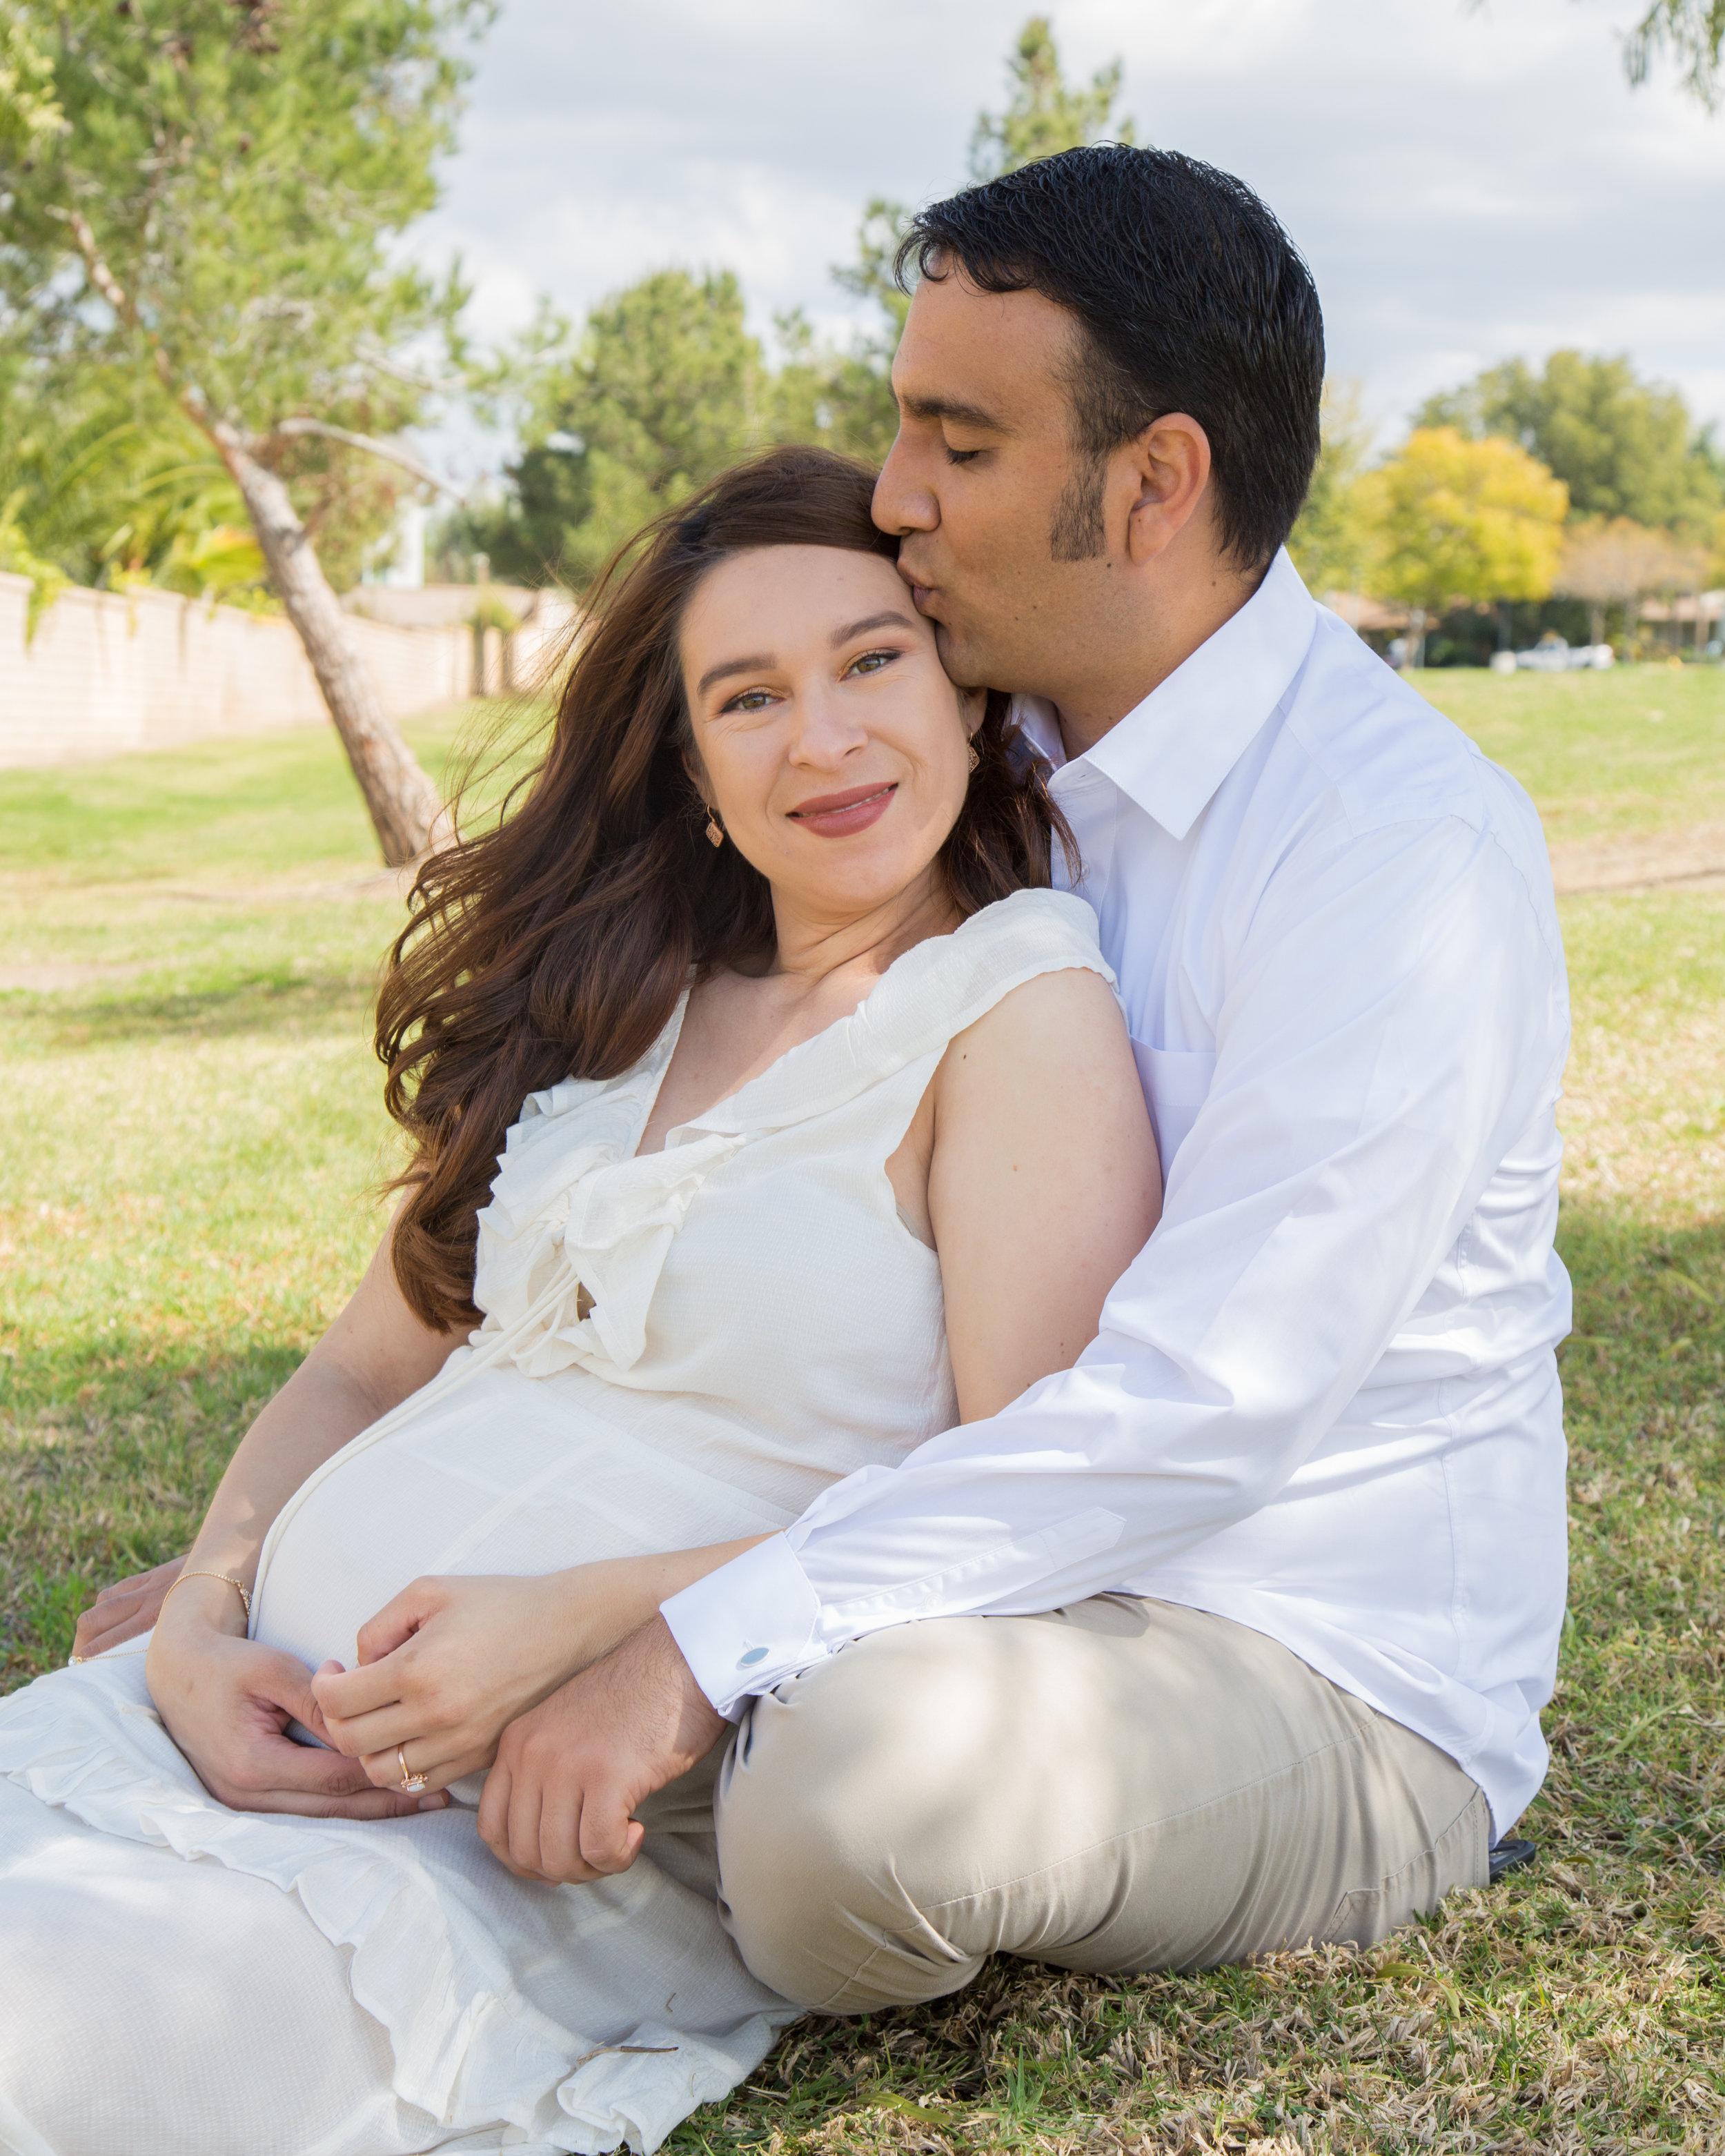 Vivianas_Maternity-48.jpg